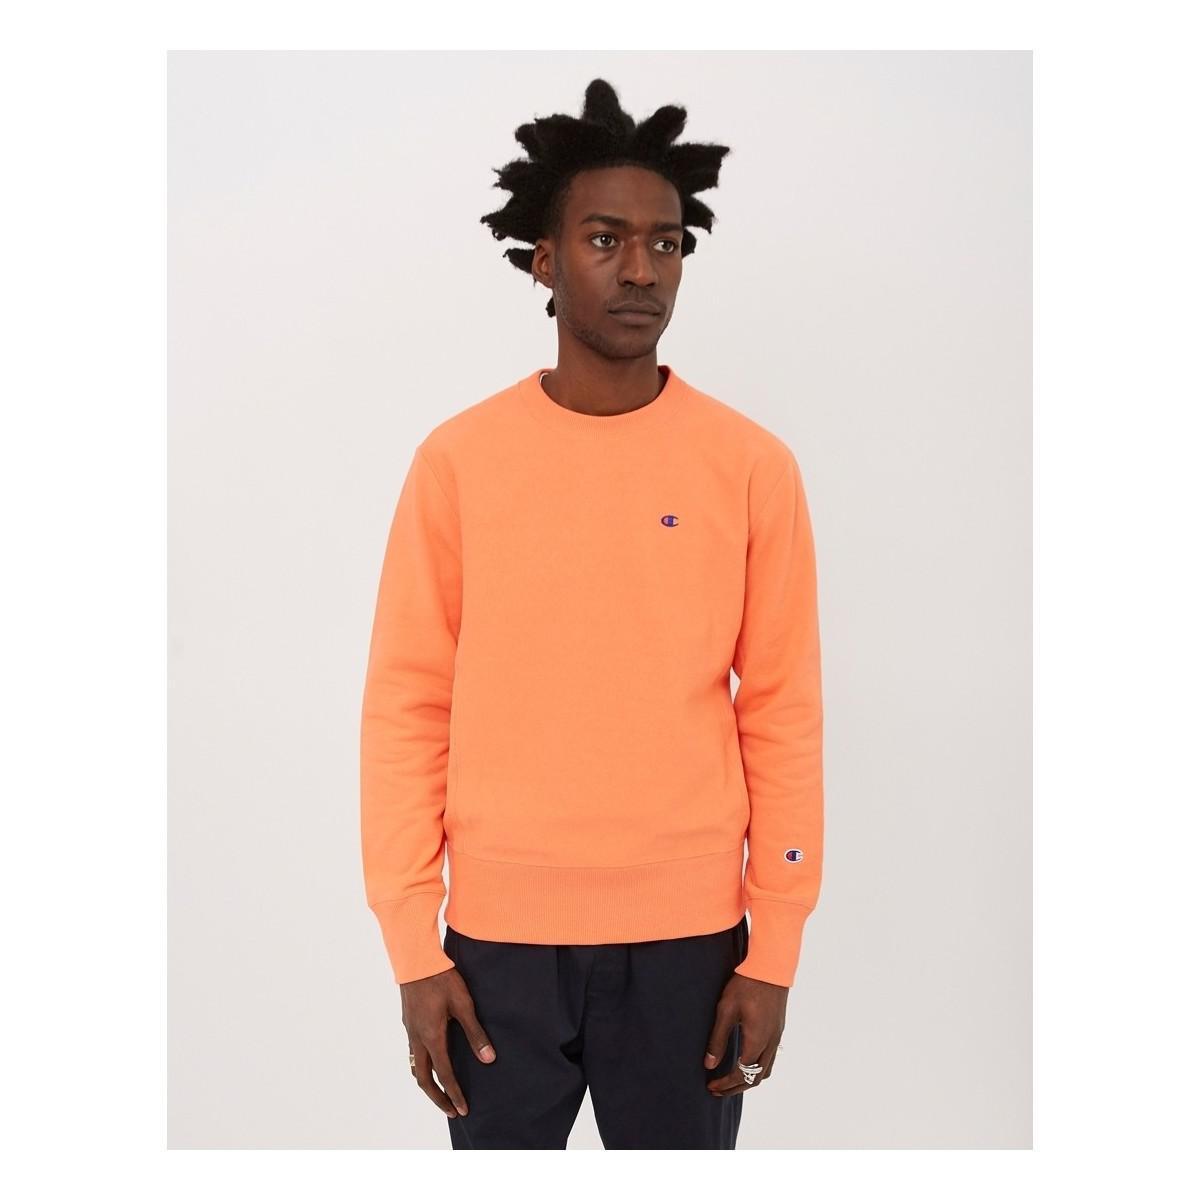 d4ced48e12da Champion Reverse Weave Crewneck Sweatshirt Coral Men's Sweater In ...